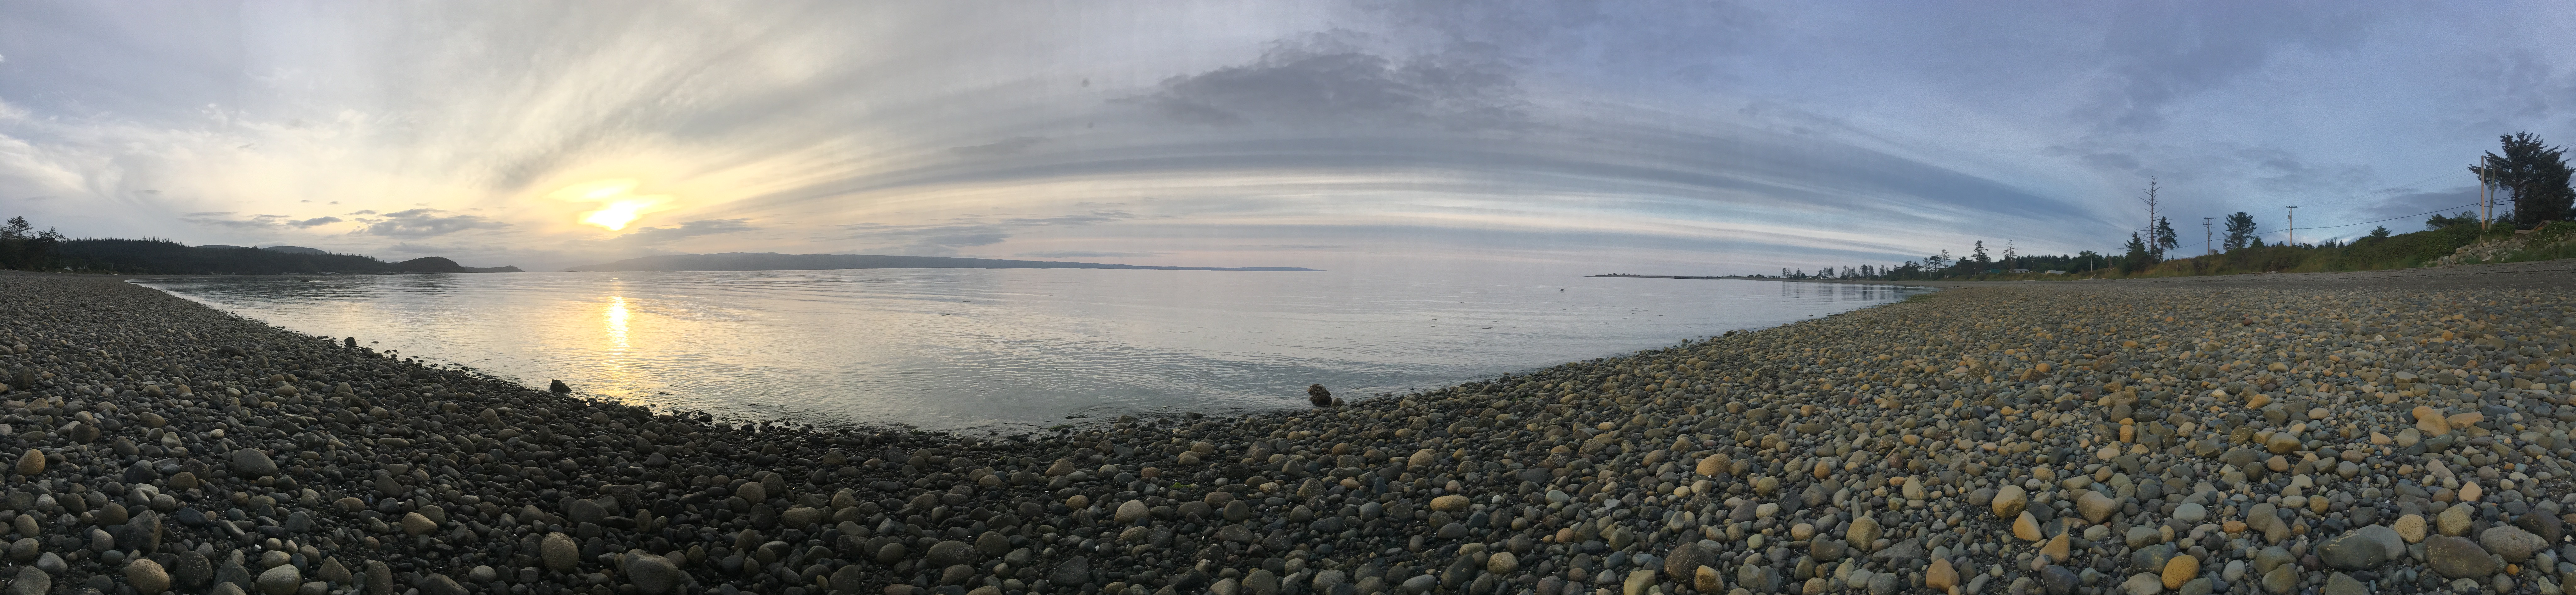 Sandspit beach at sunset